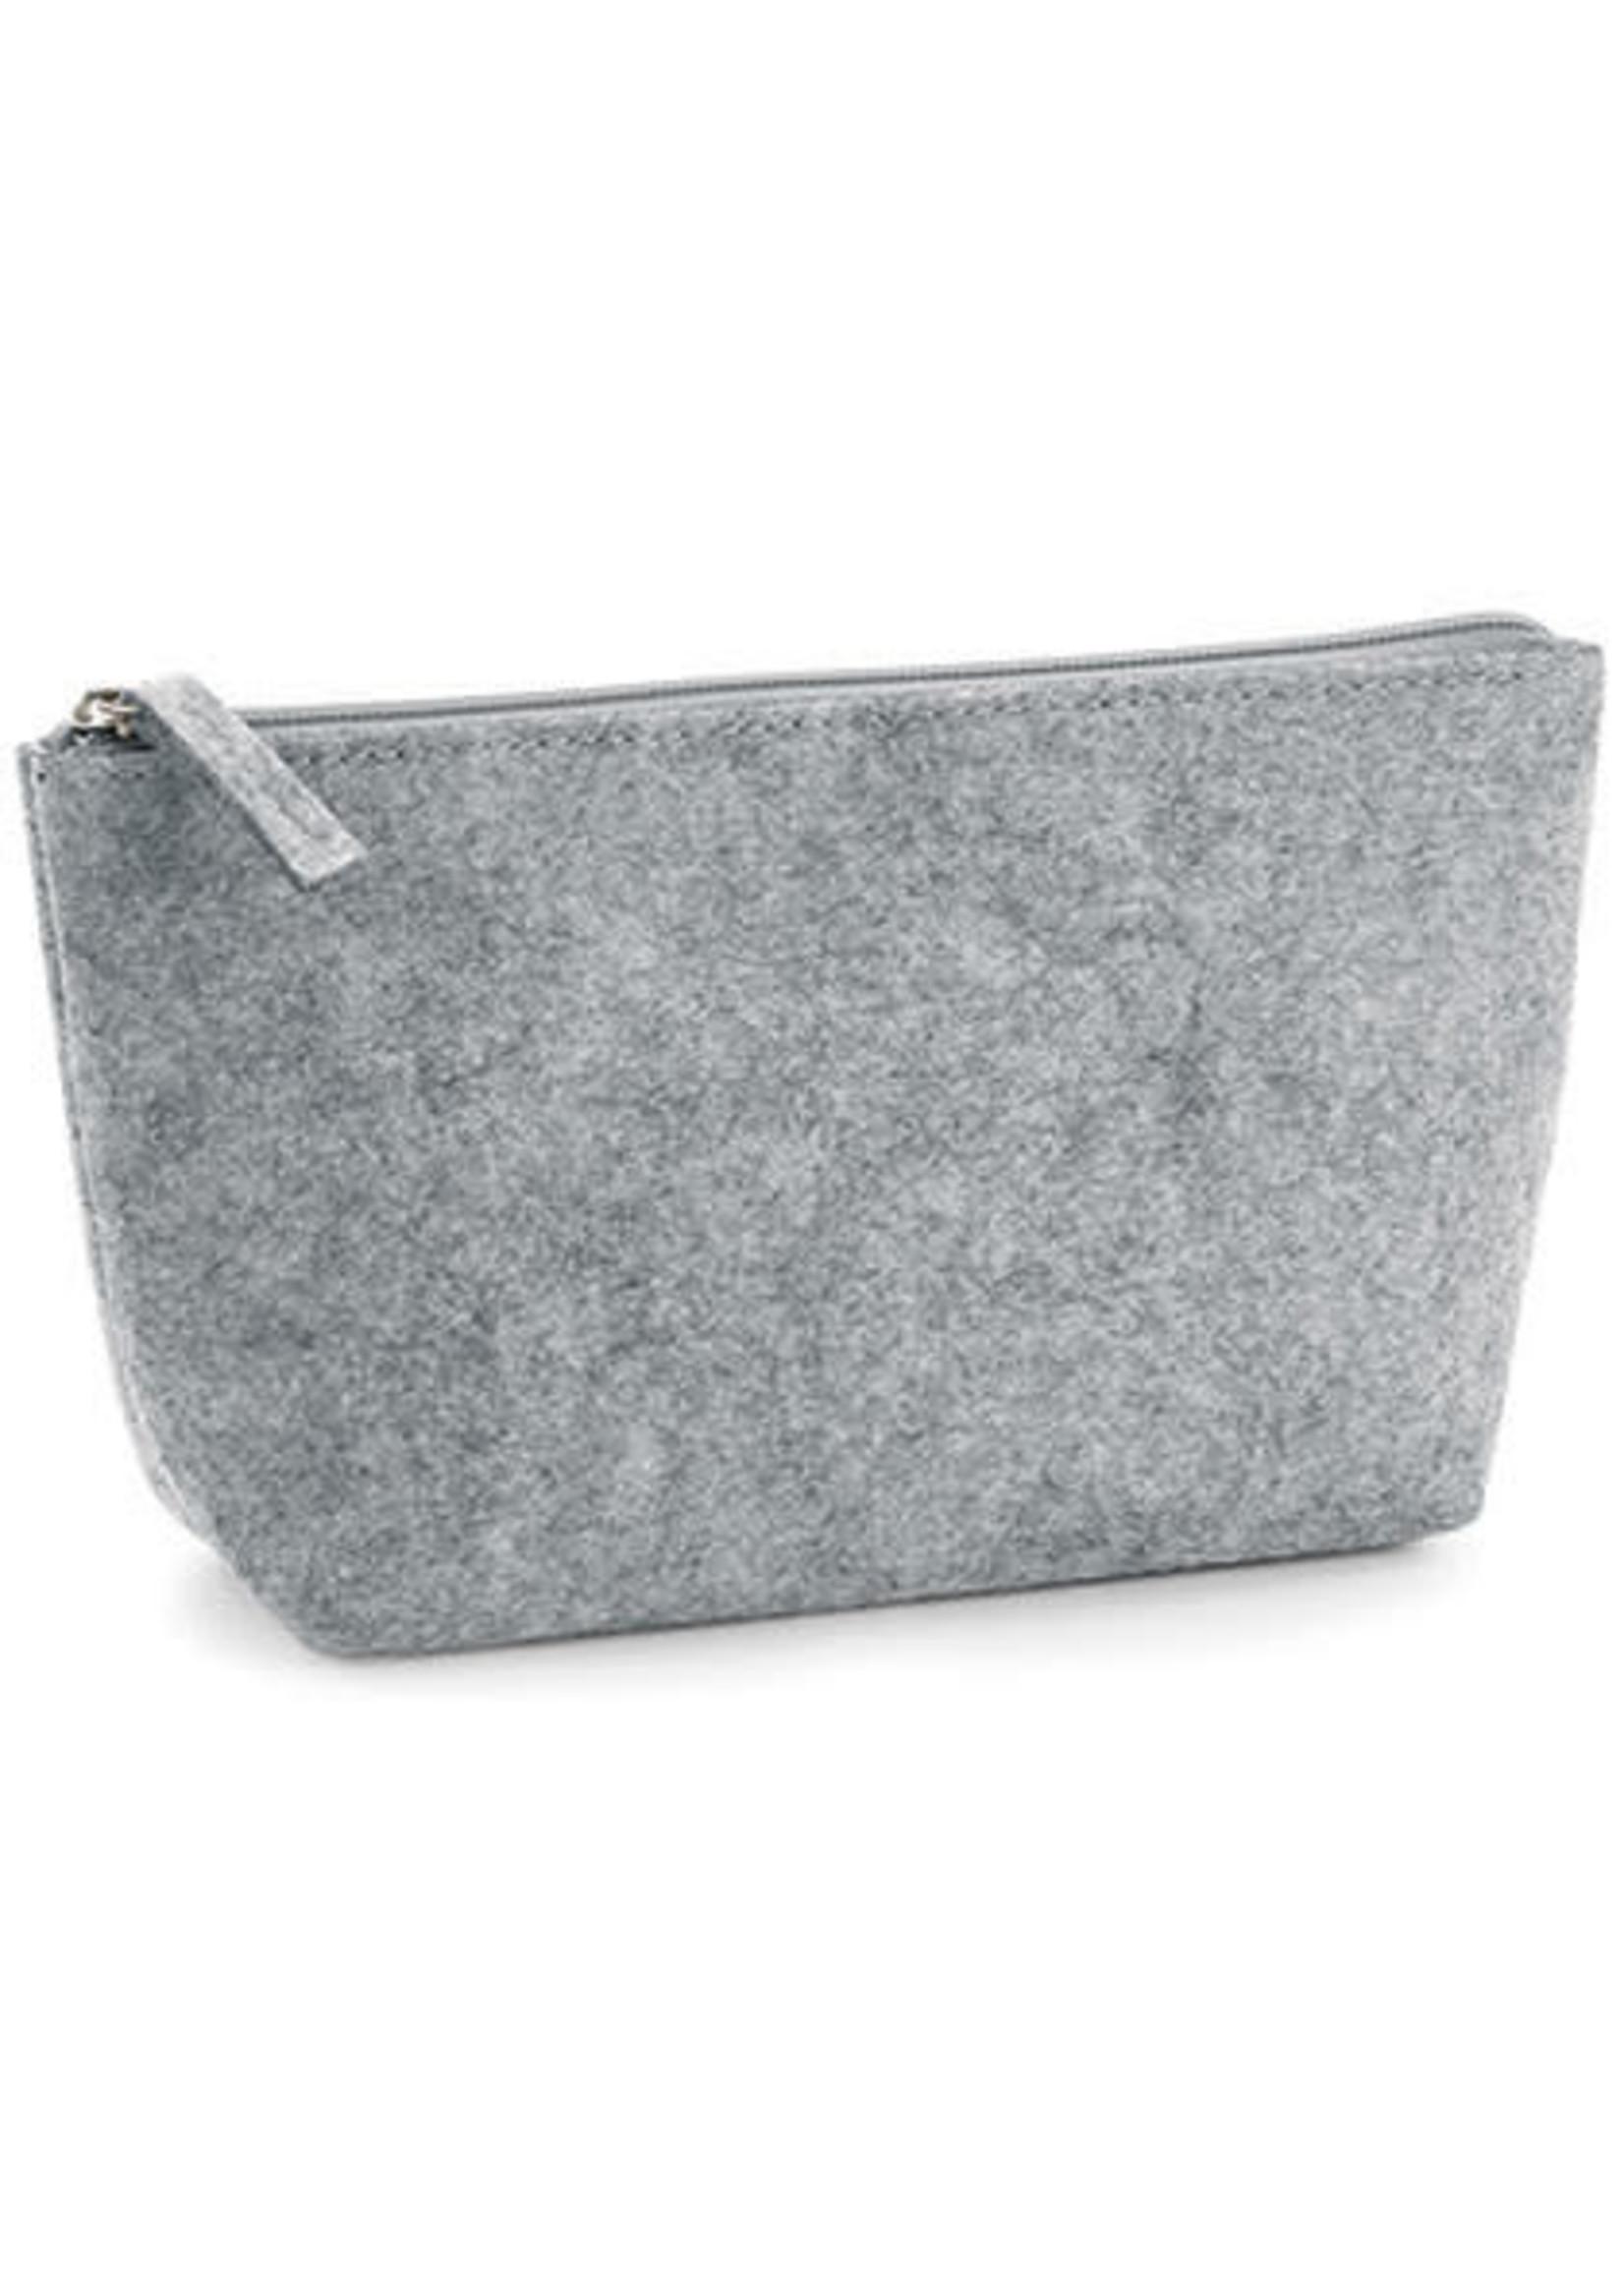 Felt Accessory Bag - Grey Melange - M